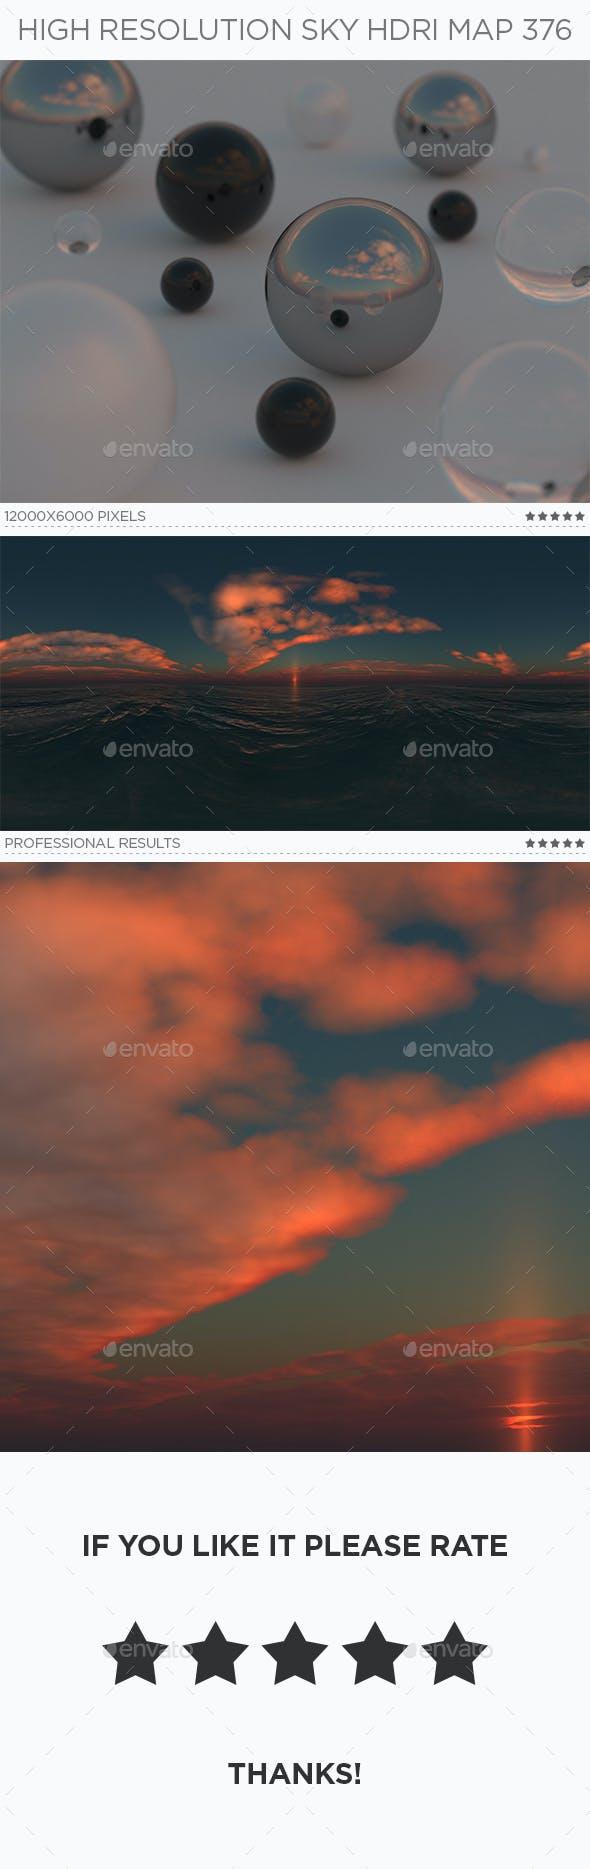 High Resolution Sky HDRi Map 376 - 3DOcean Item for Sale